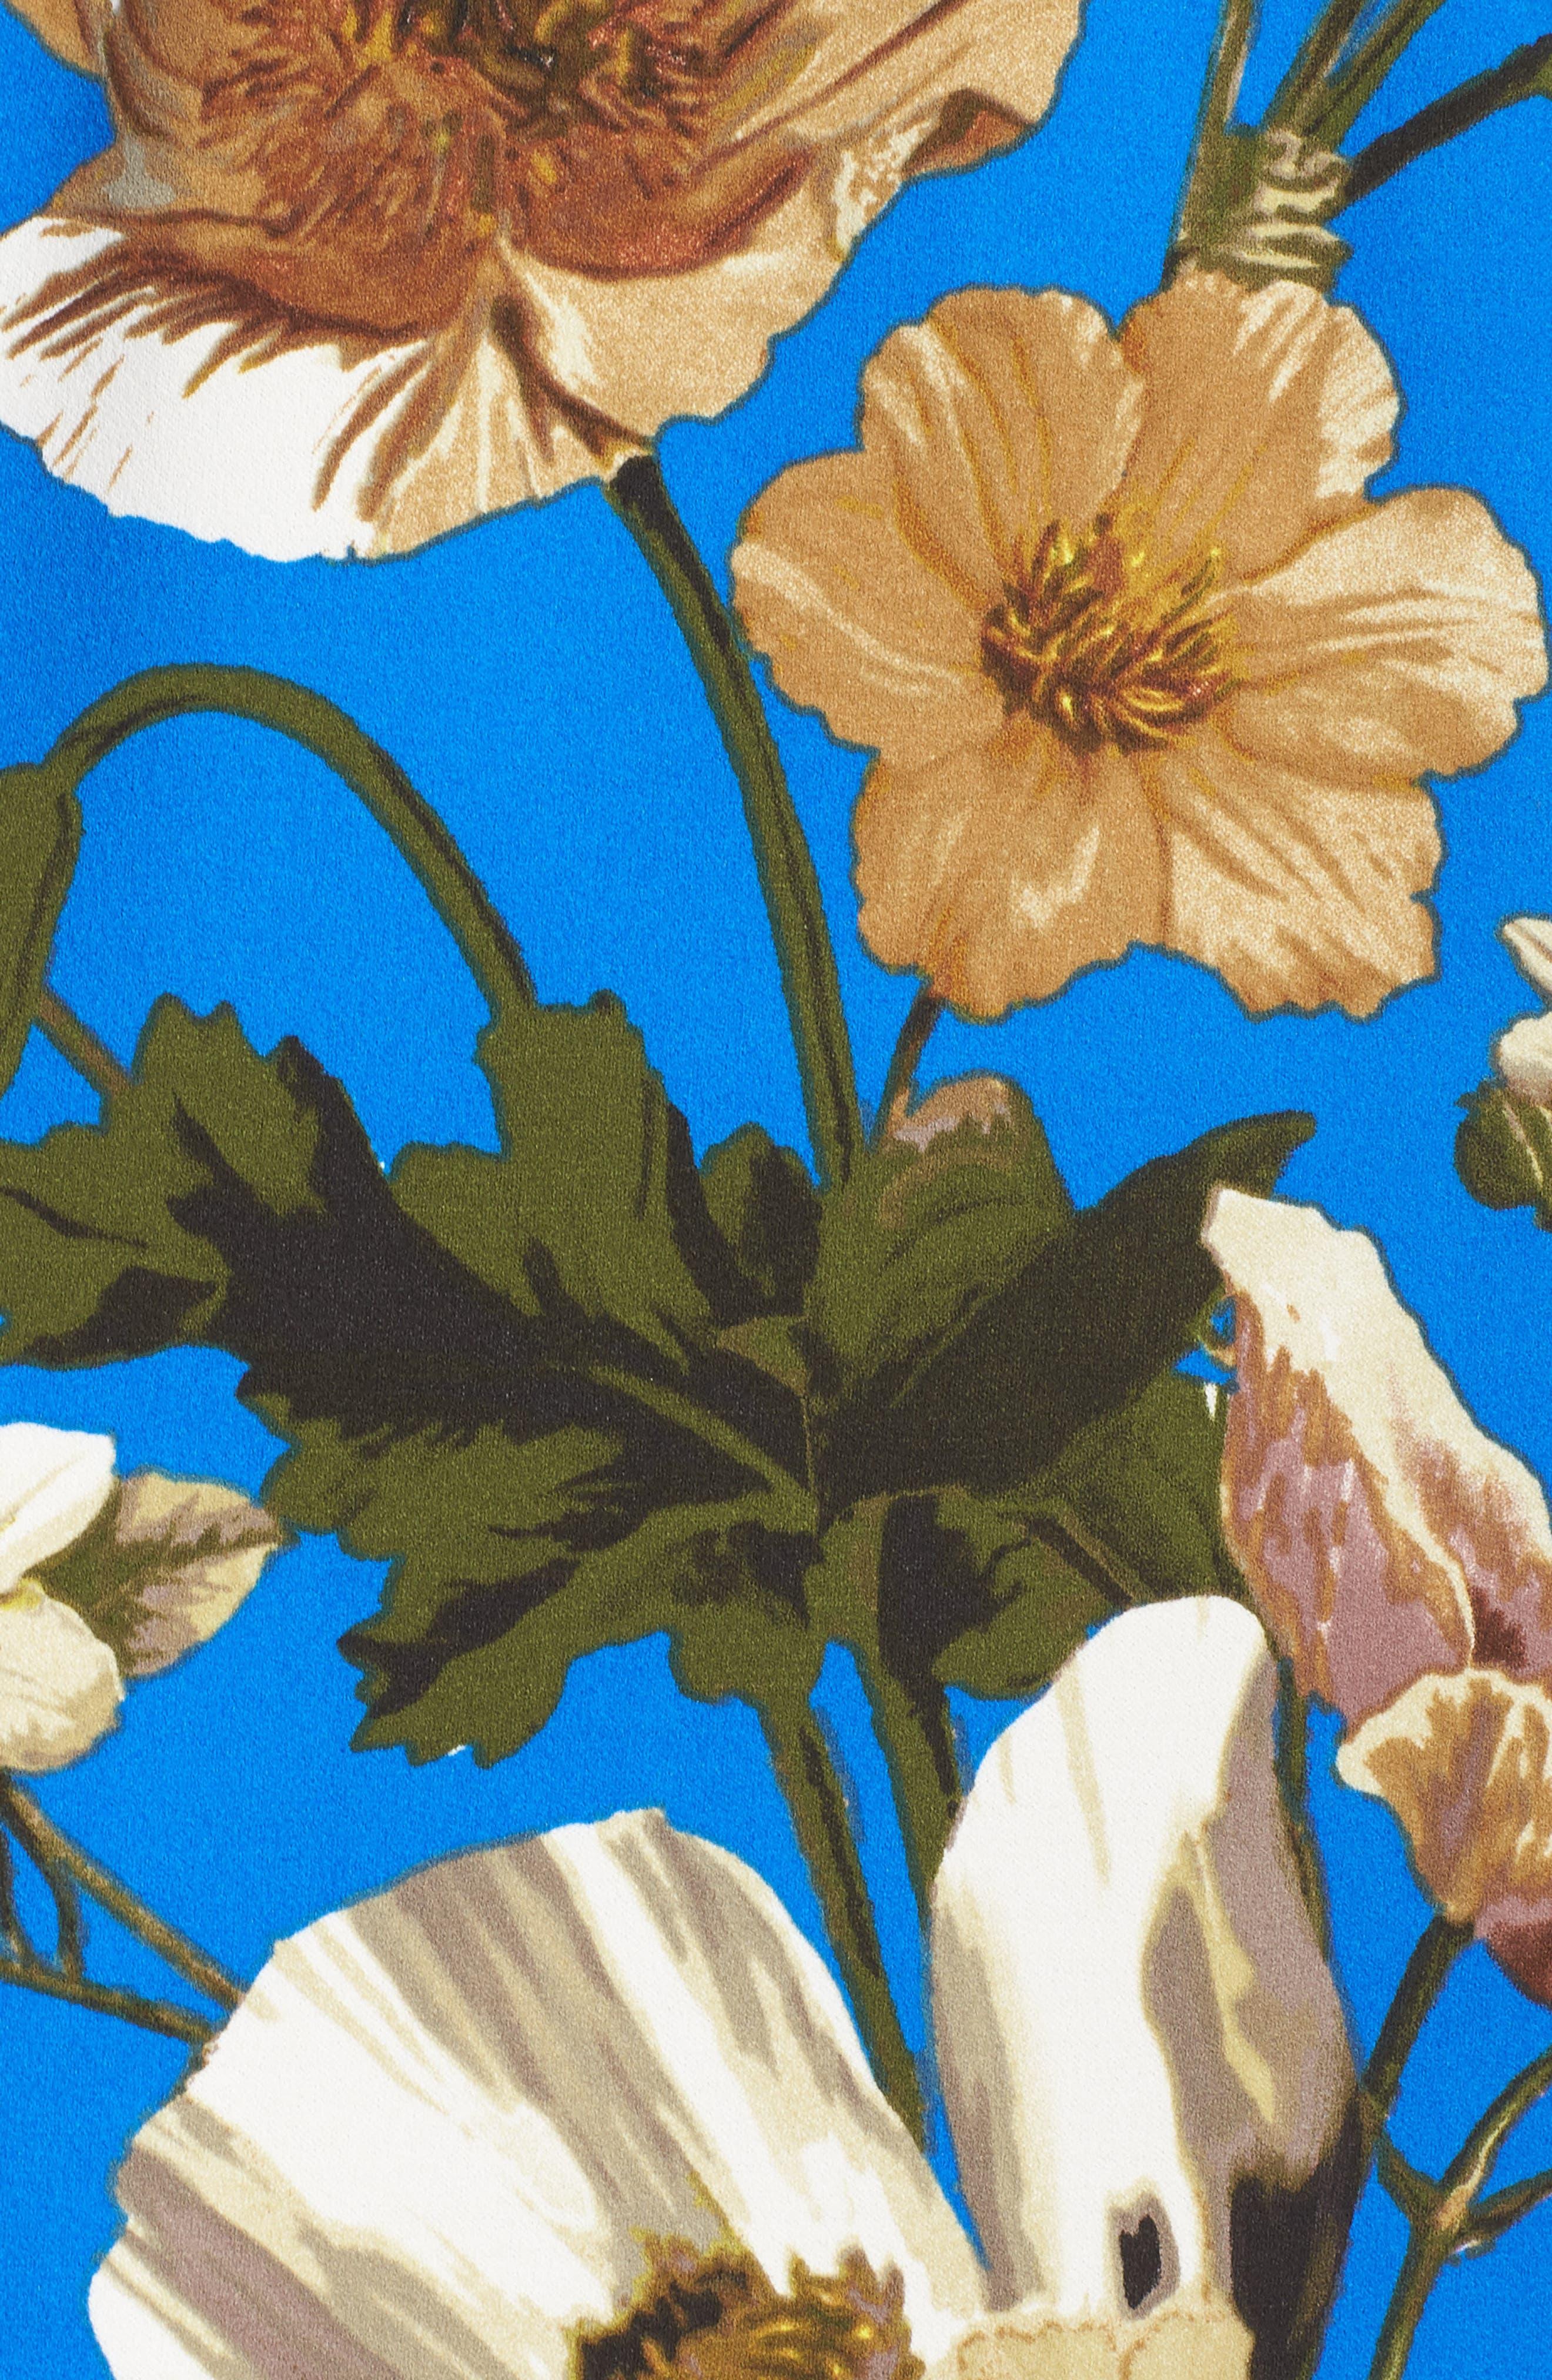 Floral Cold Shoulder Sheath Dress,                             Alternate thumbnail 6, color,                             Blue/ Neutral